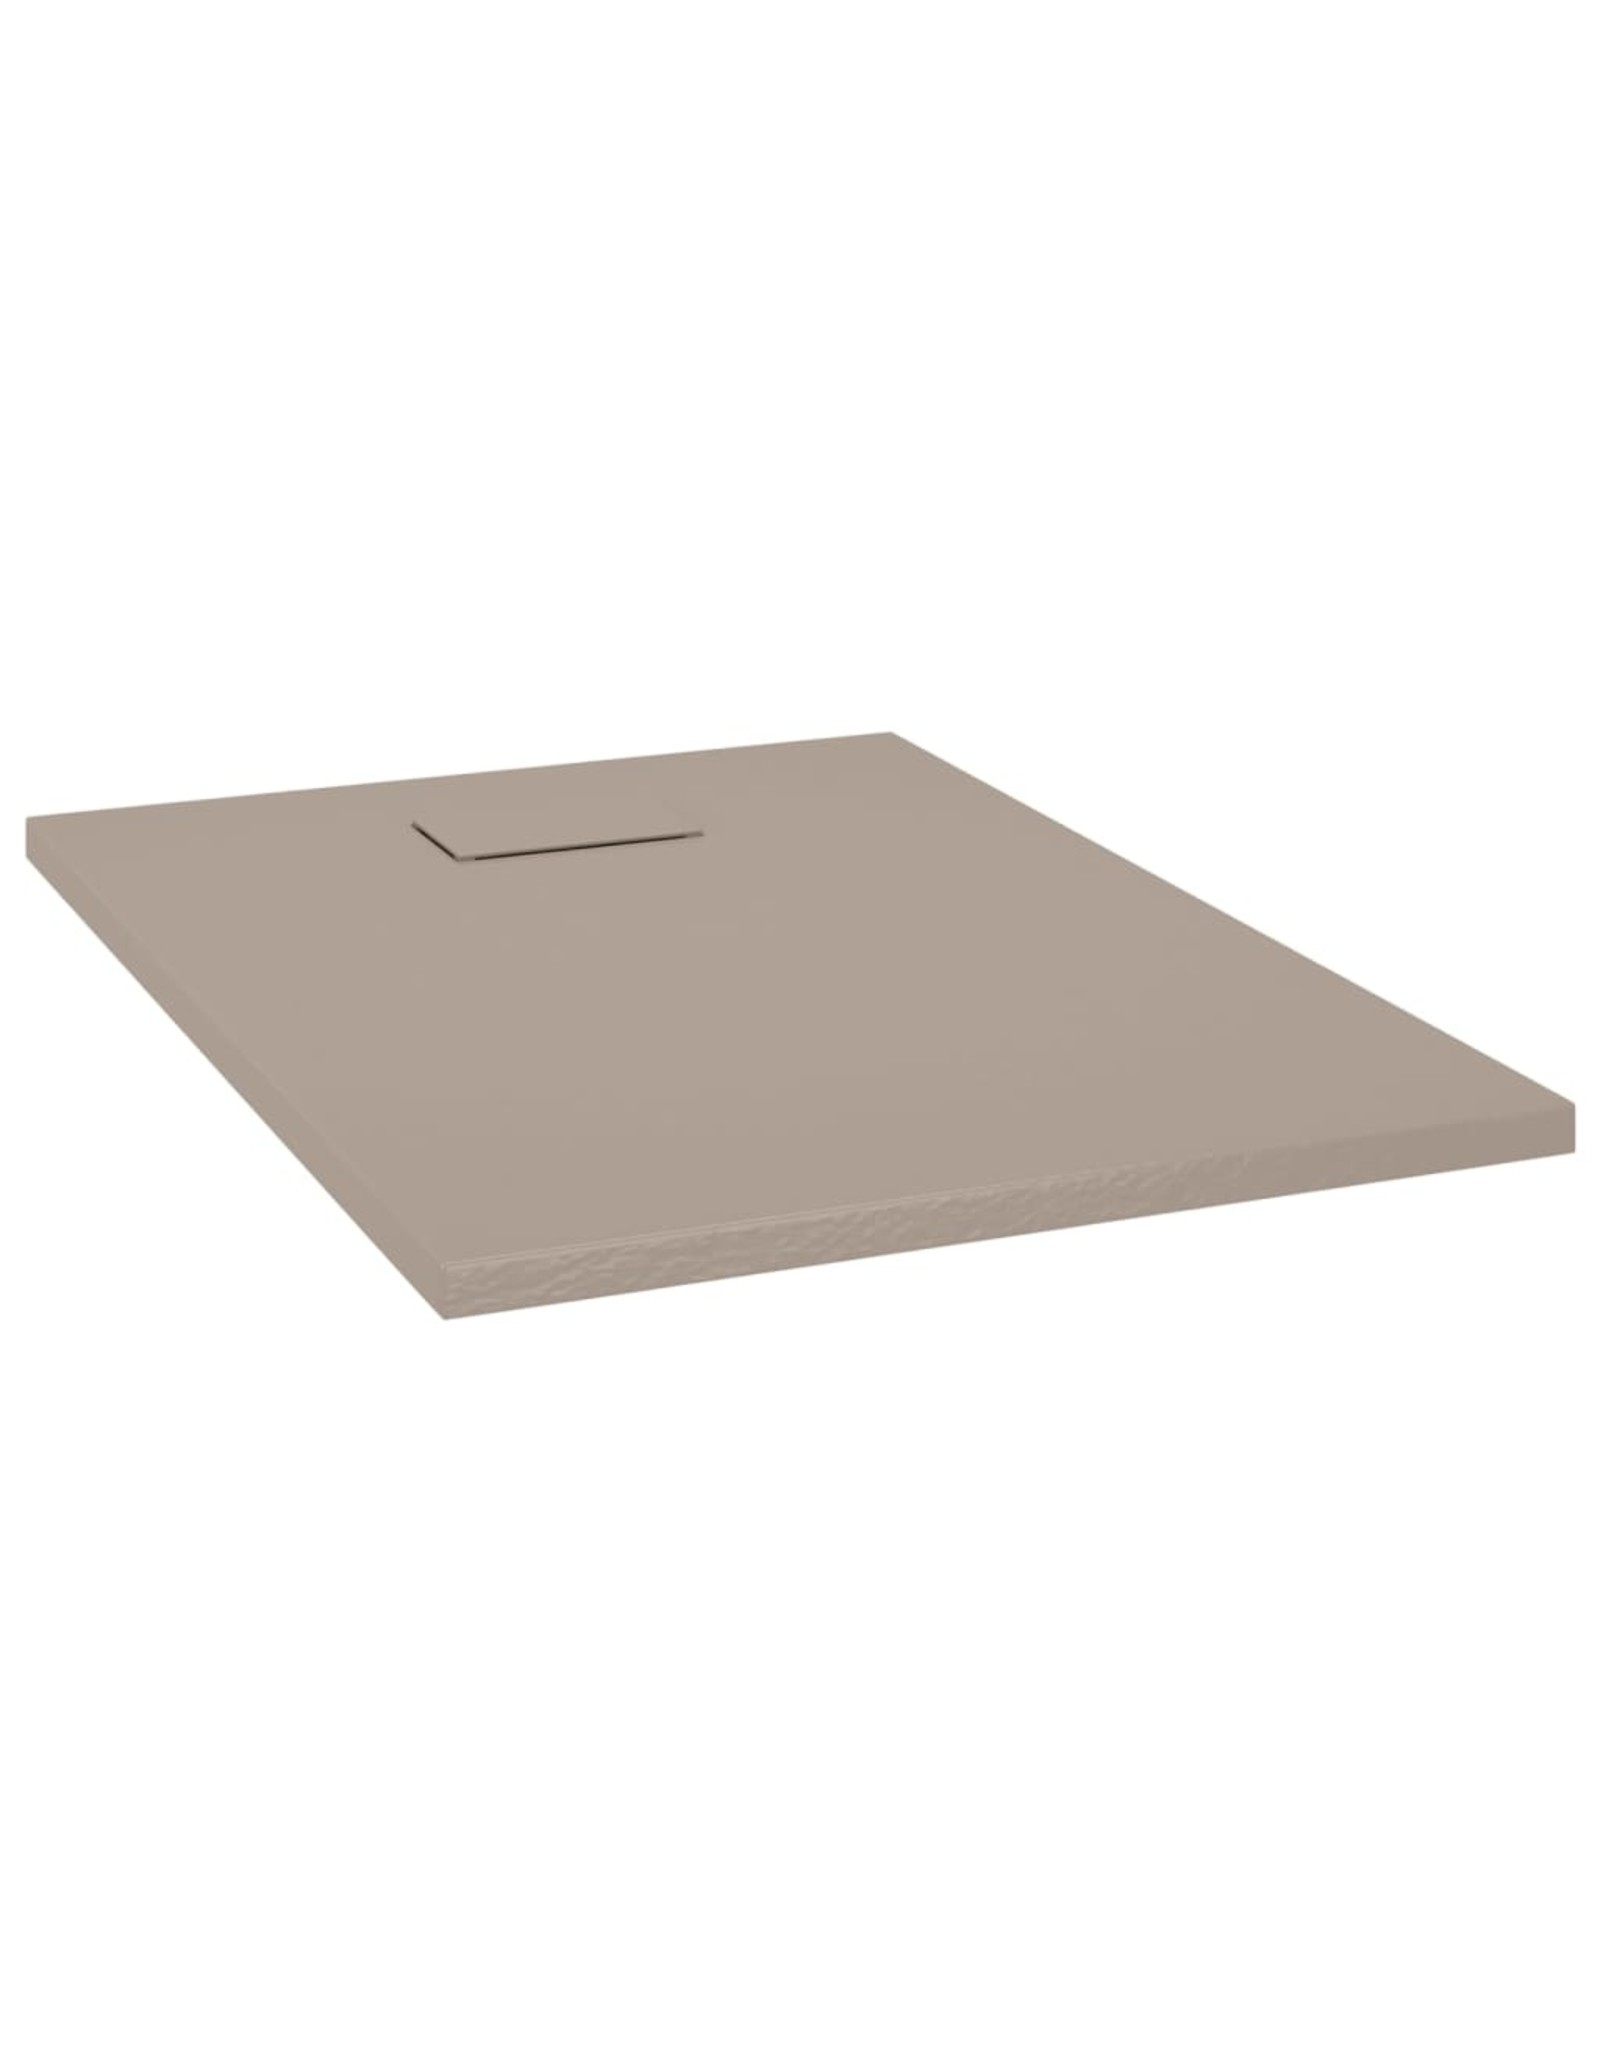 Douchebak 100x70 cm SMC bruin